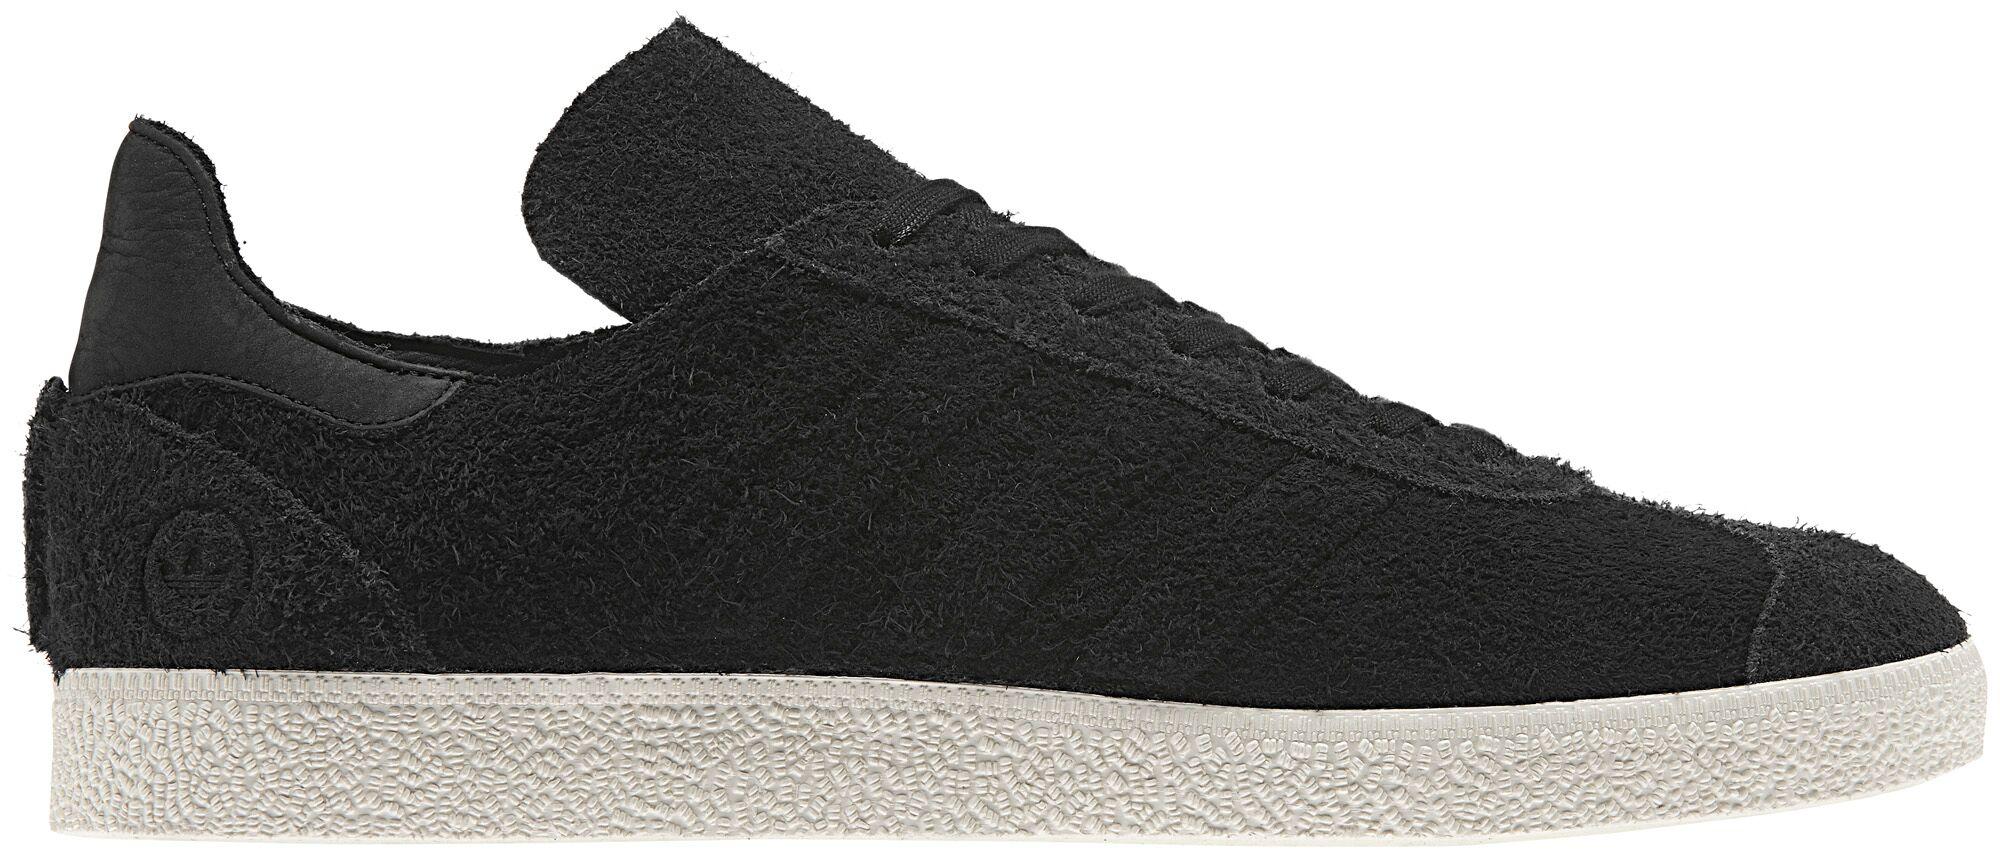 0091f797e adidas gazelle all black